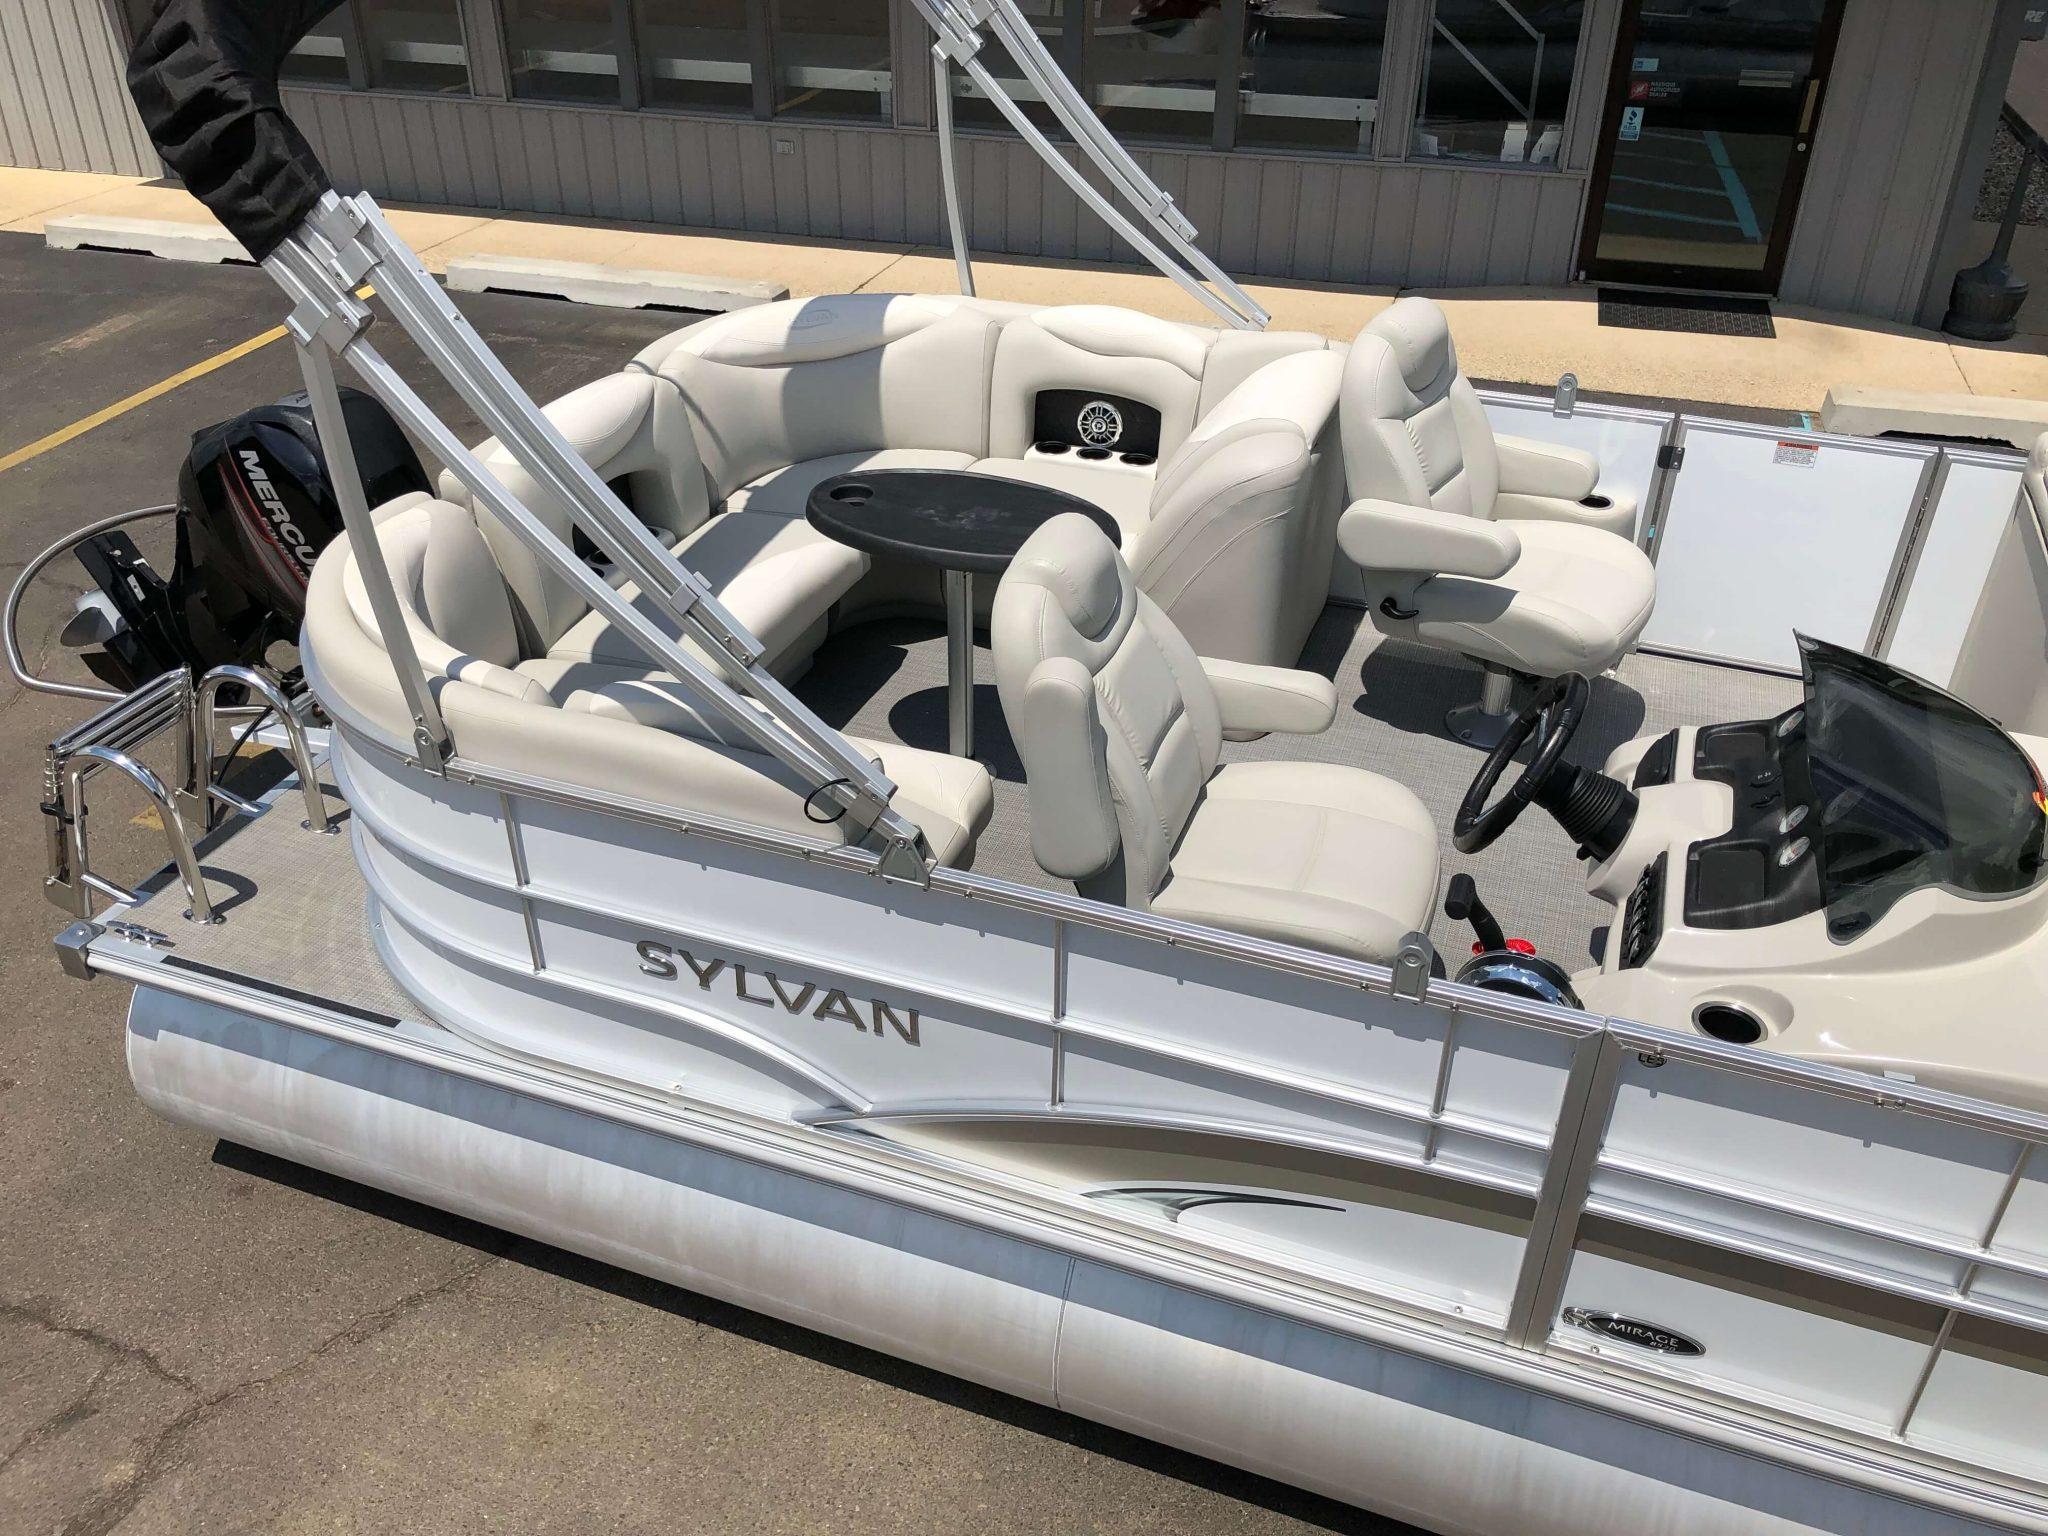 2016 Sylvan 8520 LZ LES Pontoon Boat 4